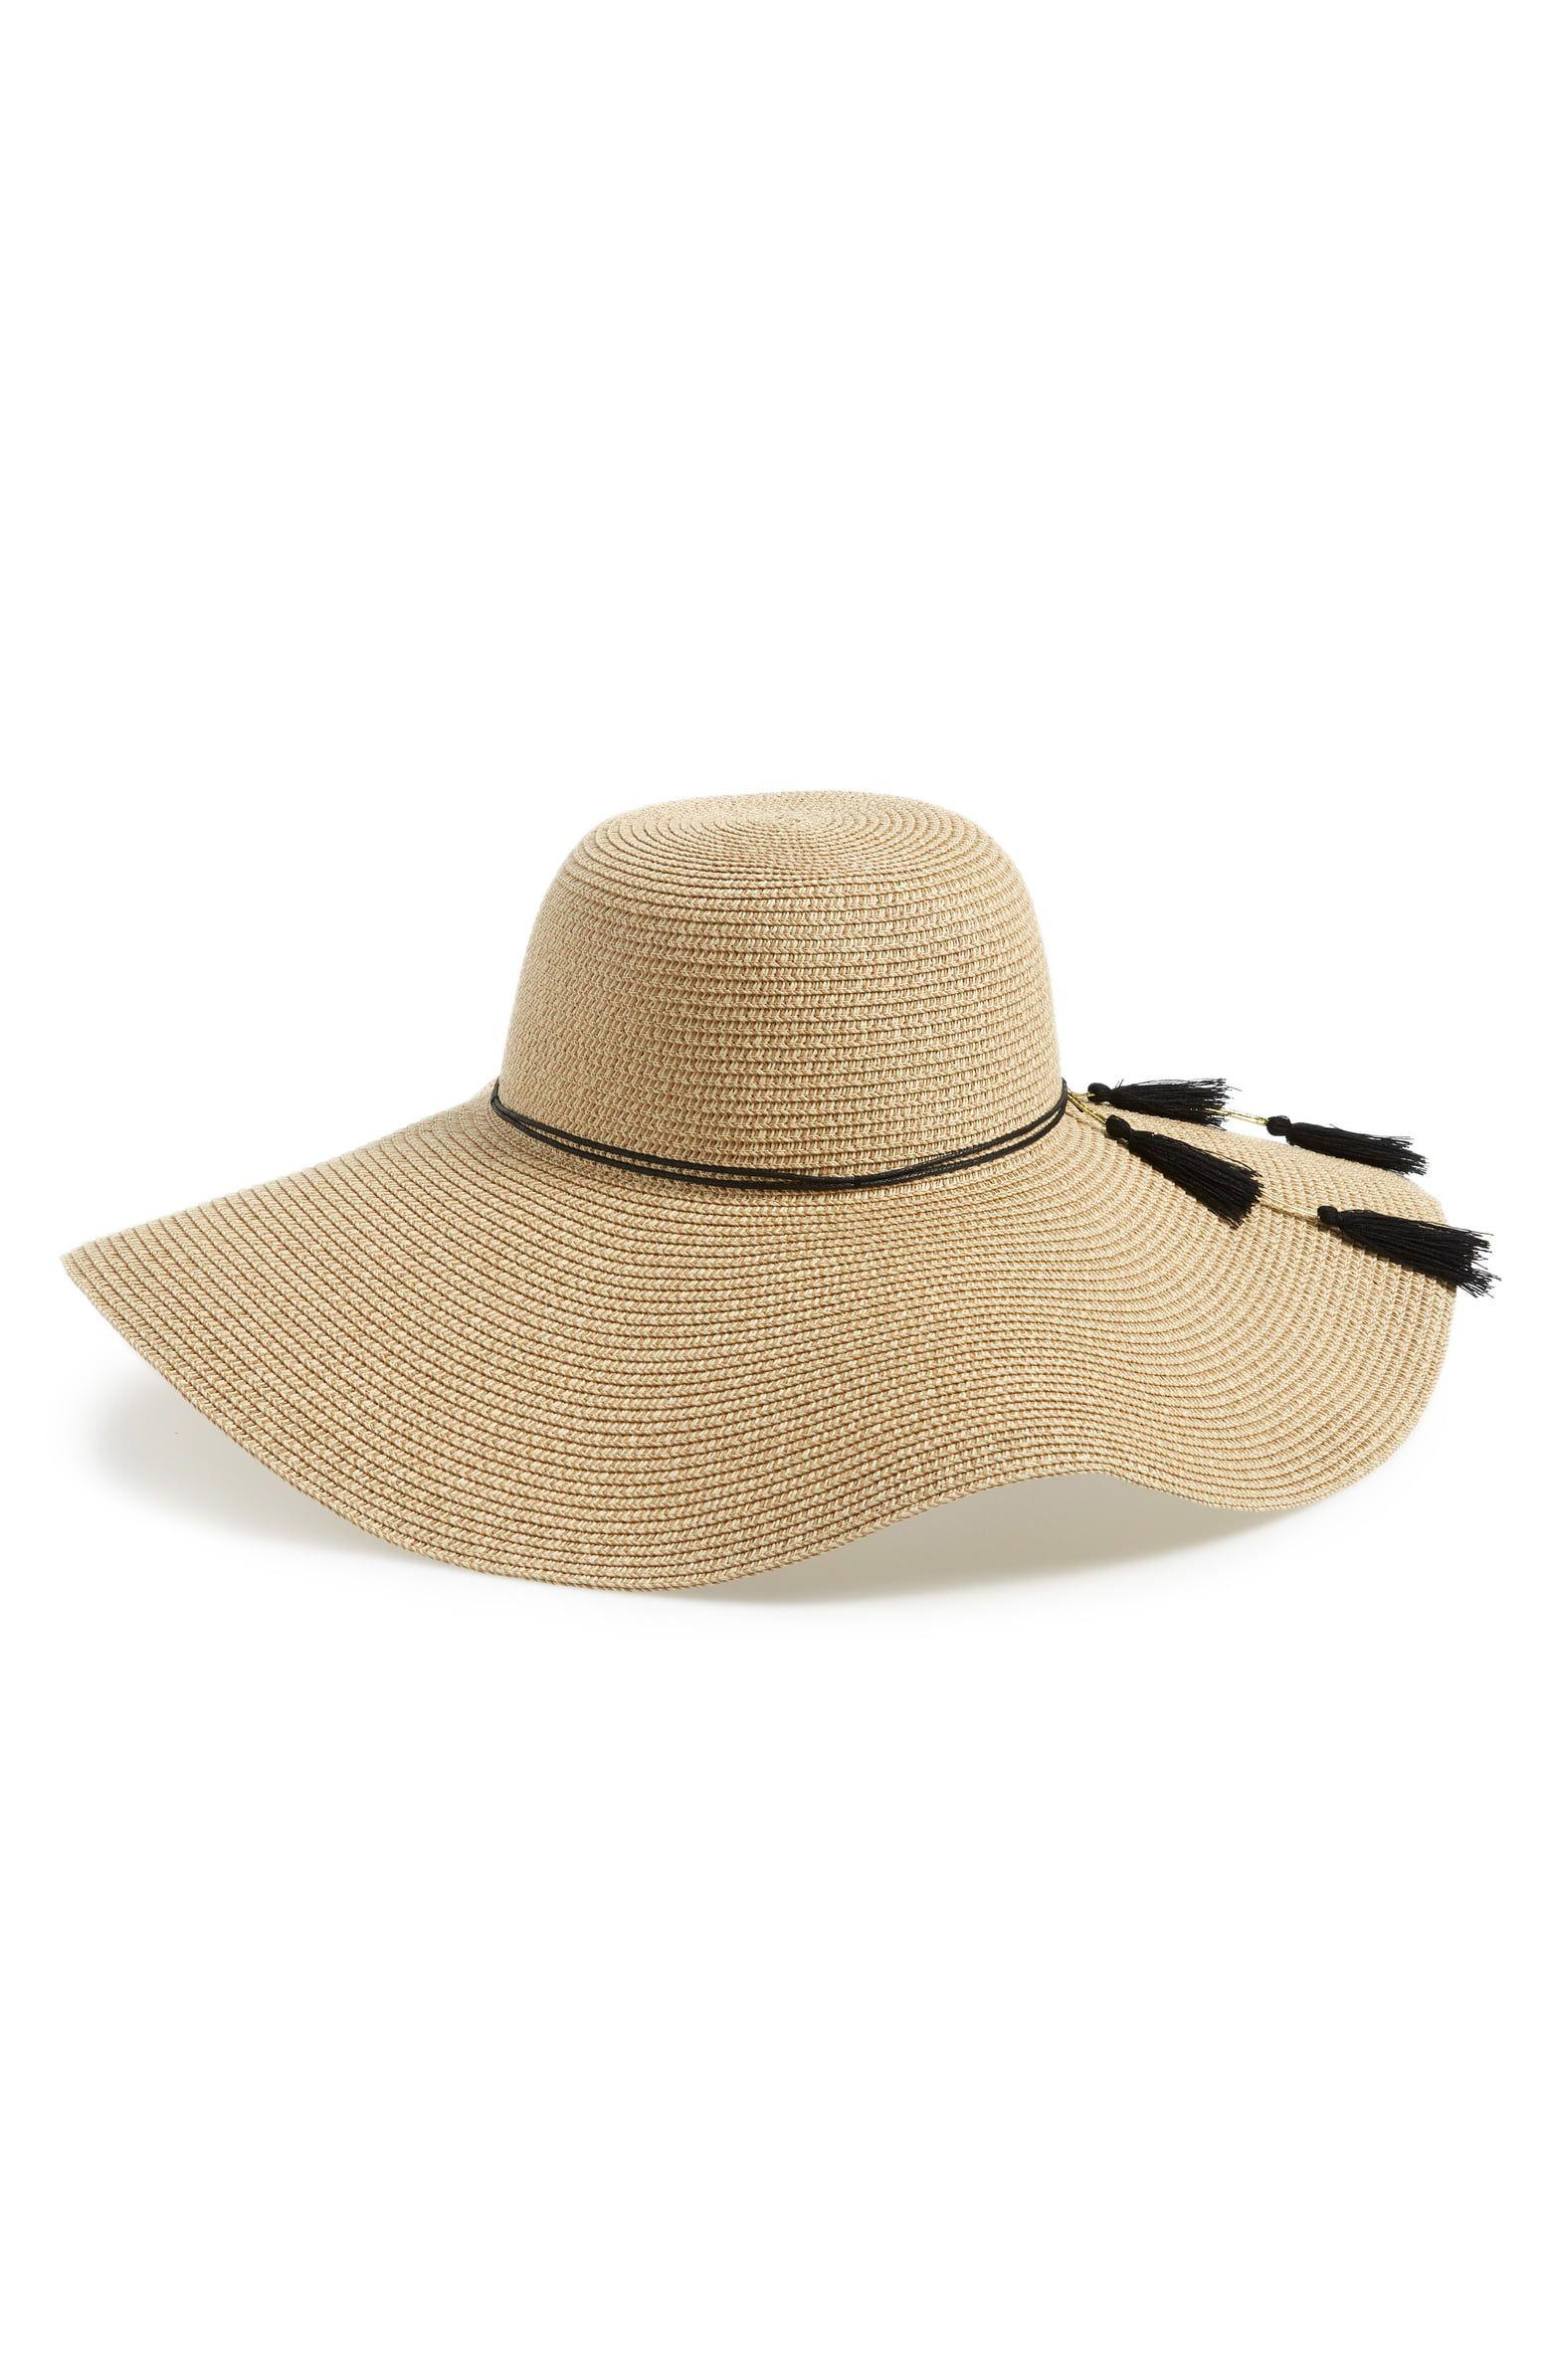 9fa0d4b0 Shiraleah Hermosa Floppy Brim Straw Hat | Nordstrom | Clothing For ...